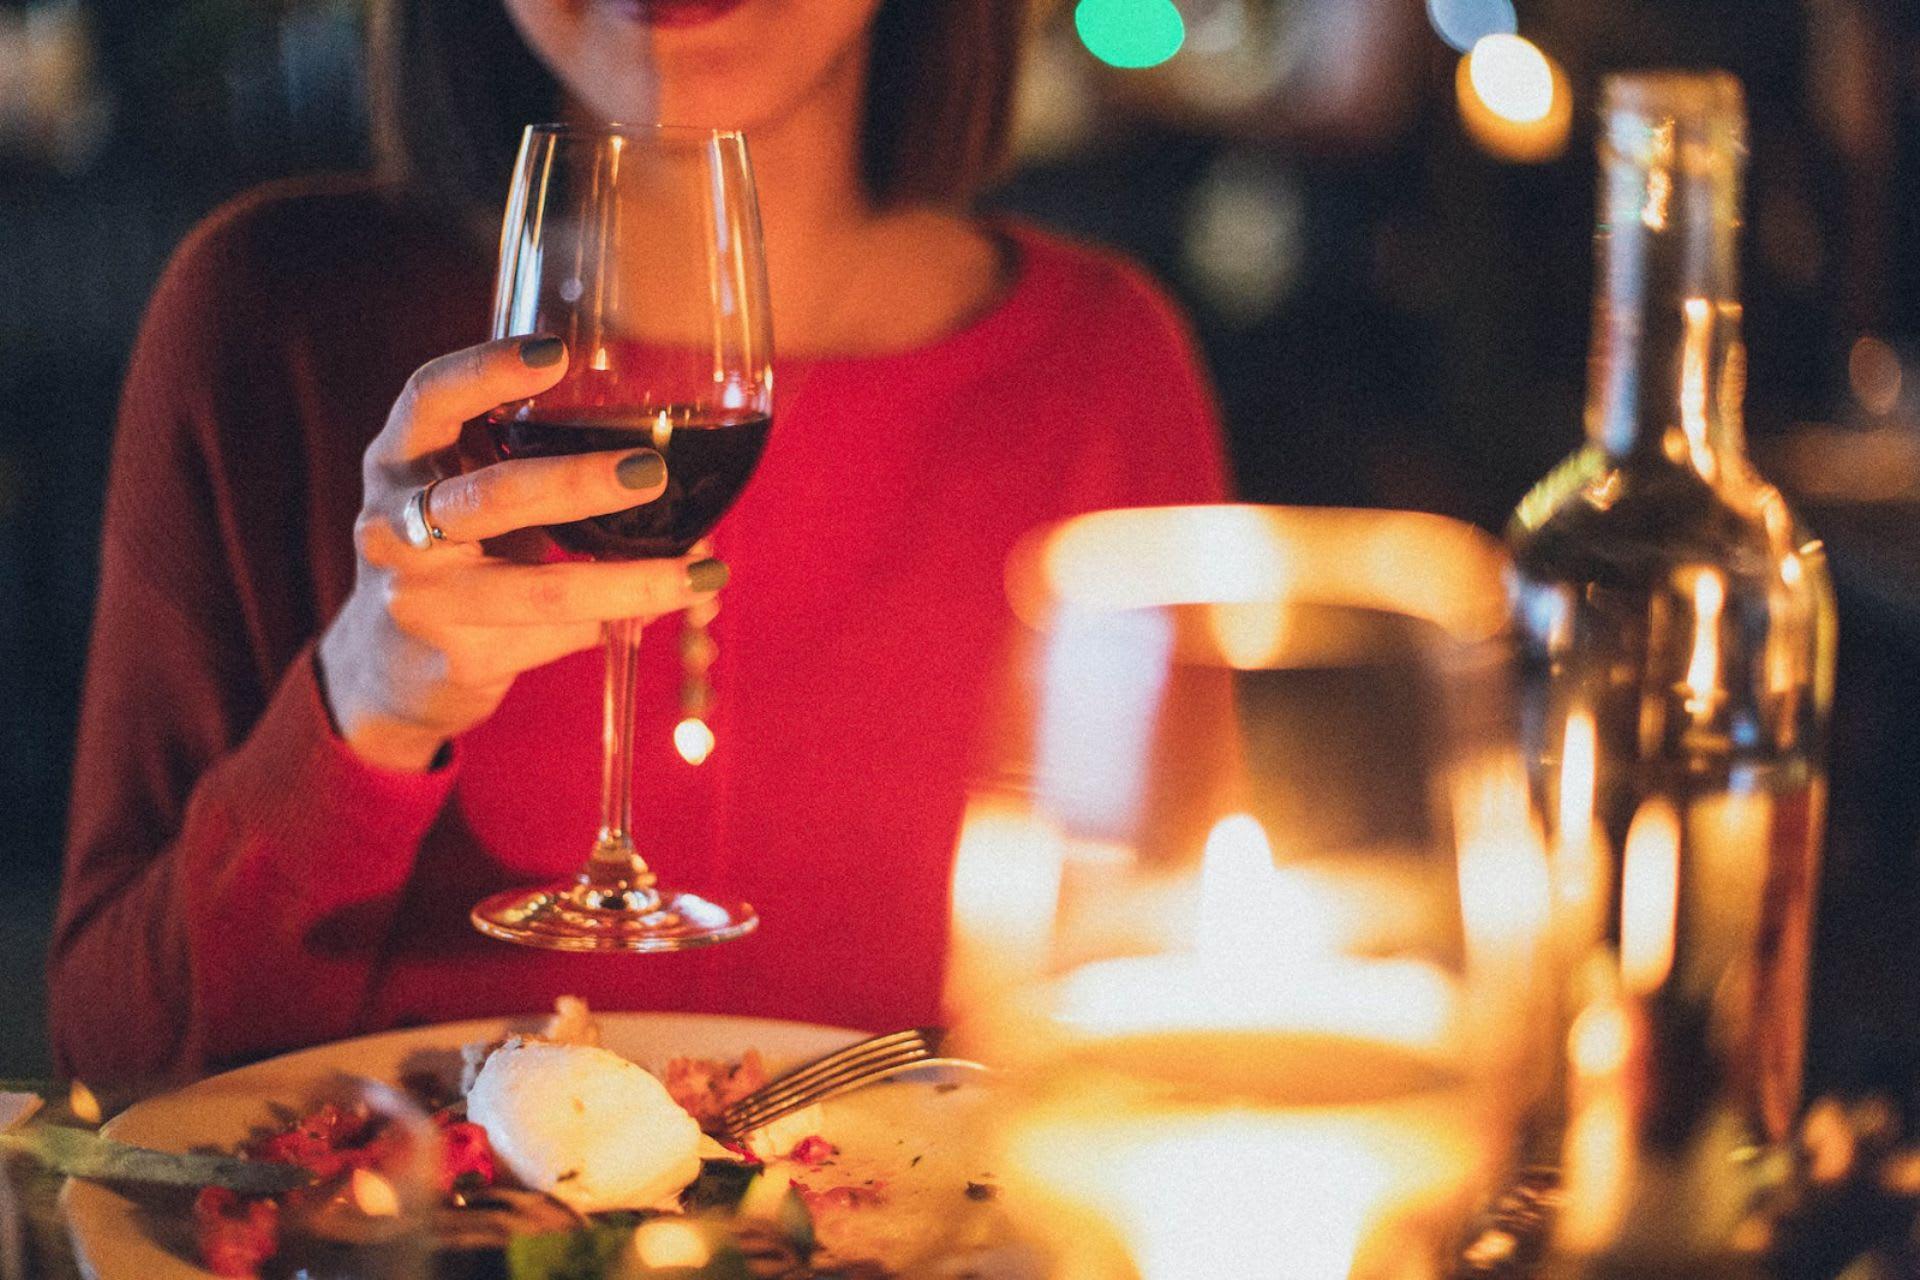 10 Best Bergen County Restaurants for Date Night